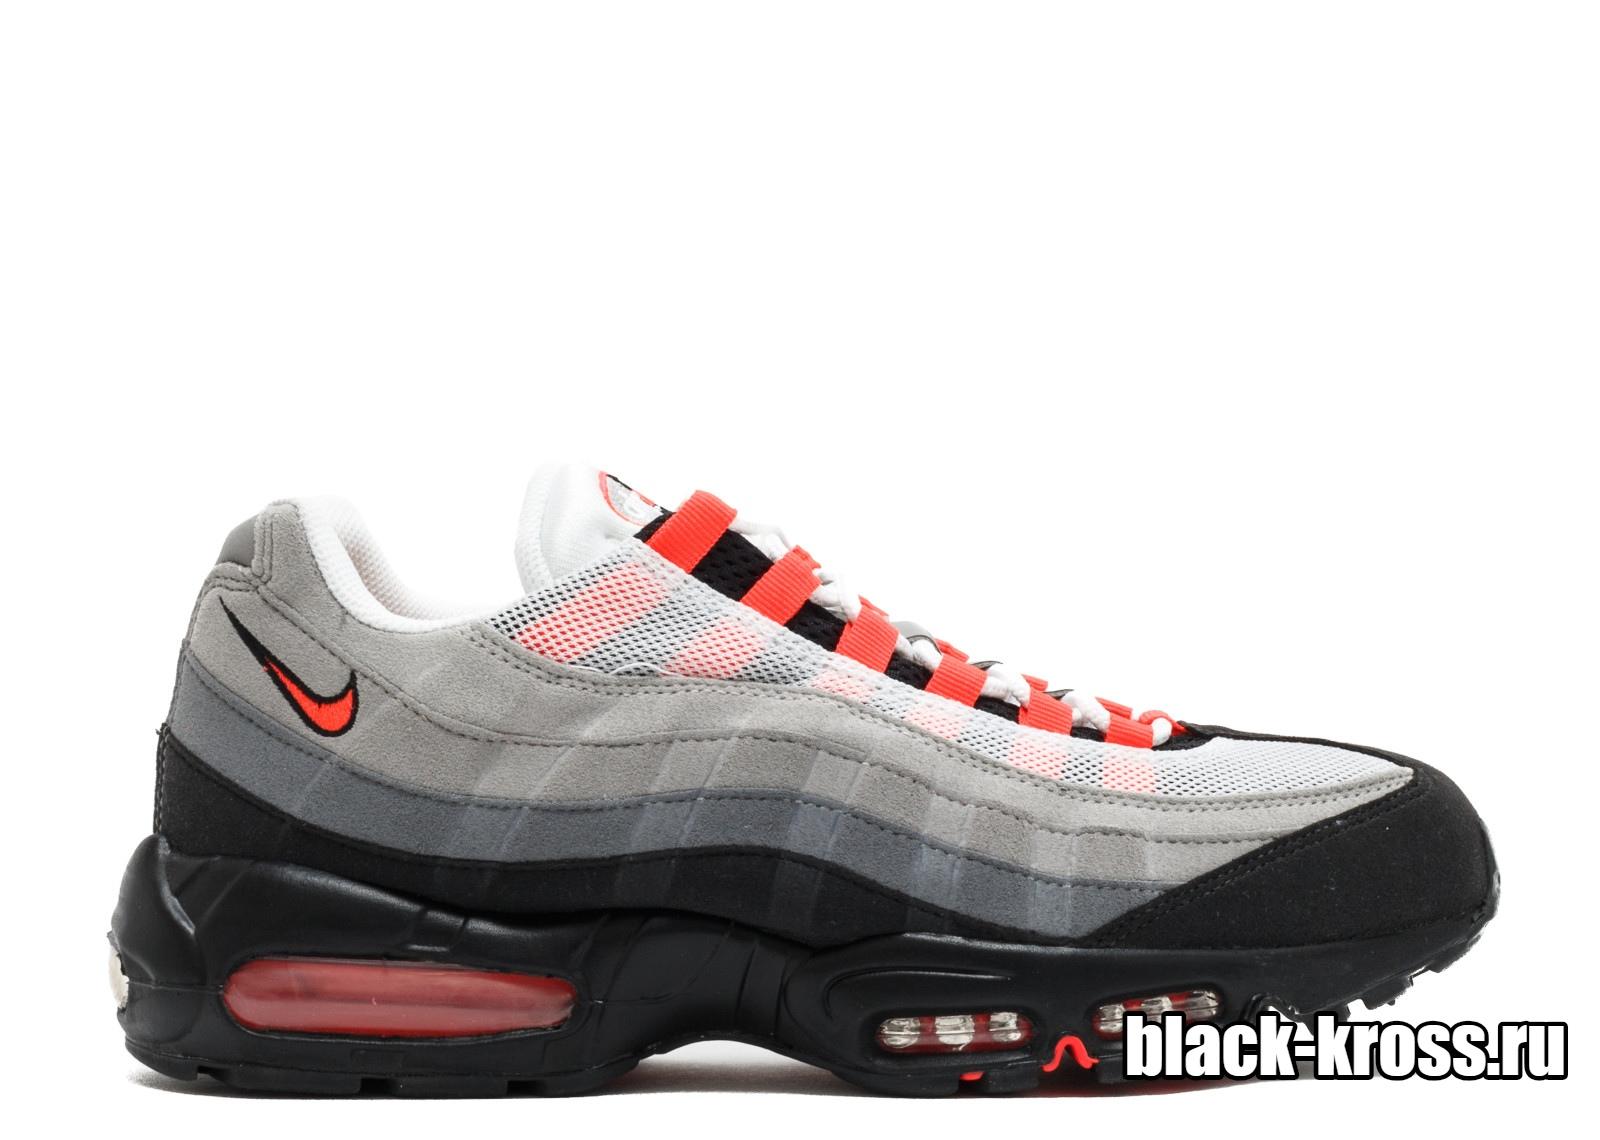 Nike Air Max 95 Black/Grey/Orange (41-45)